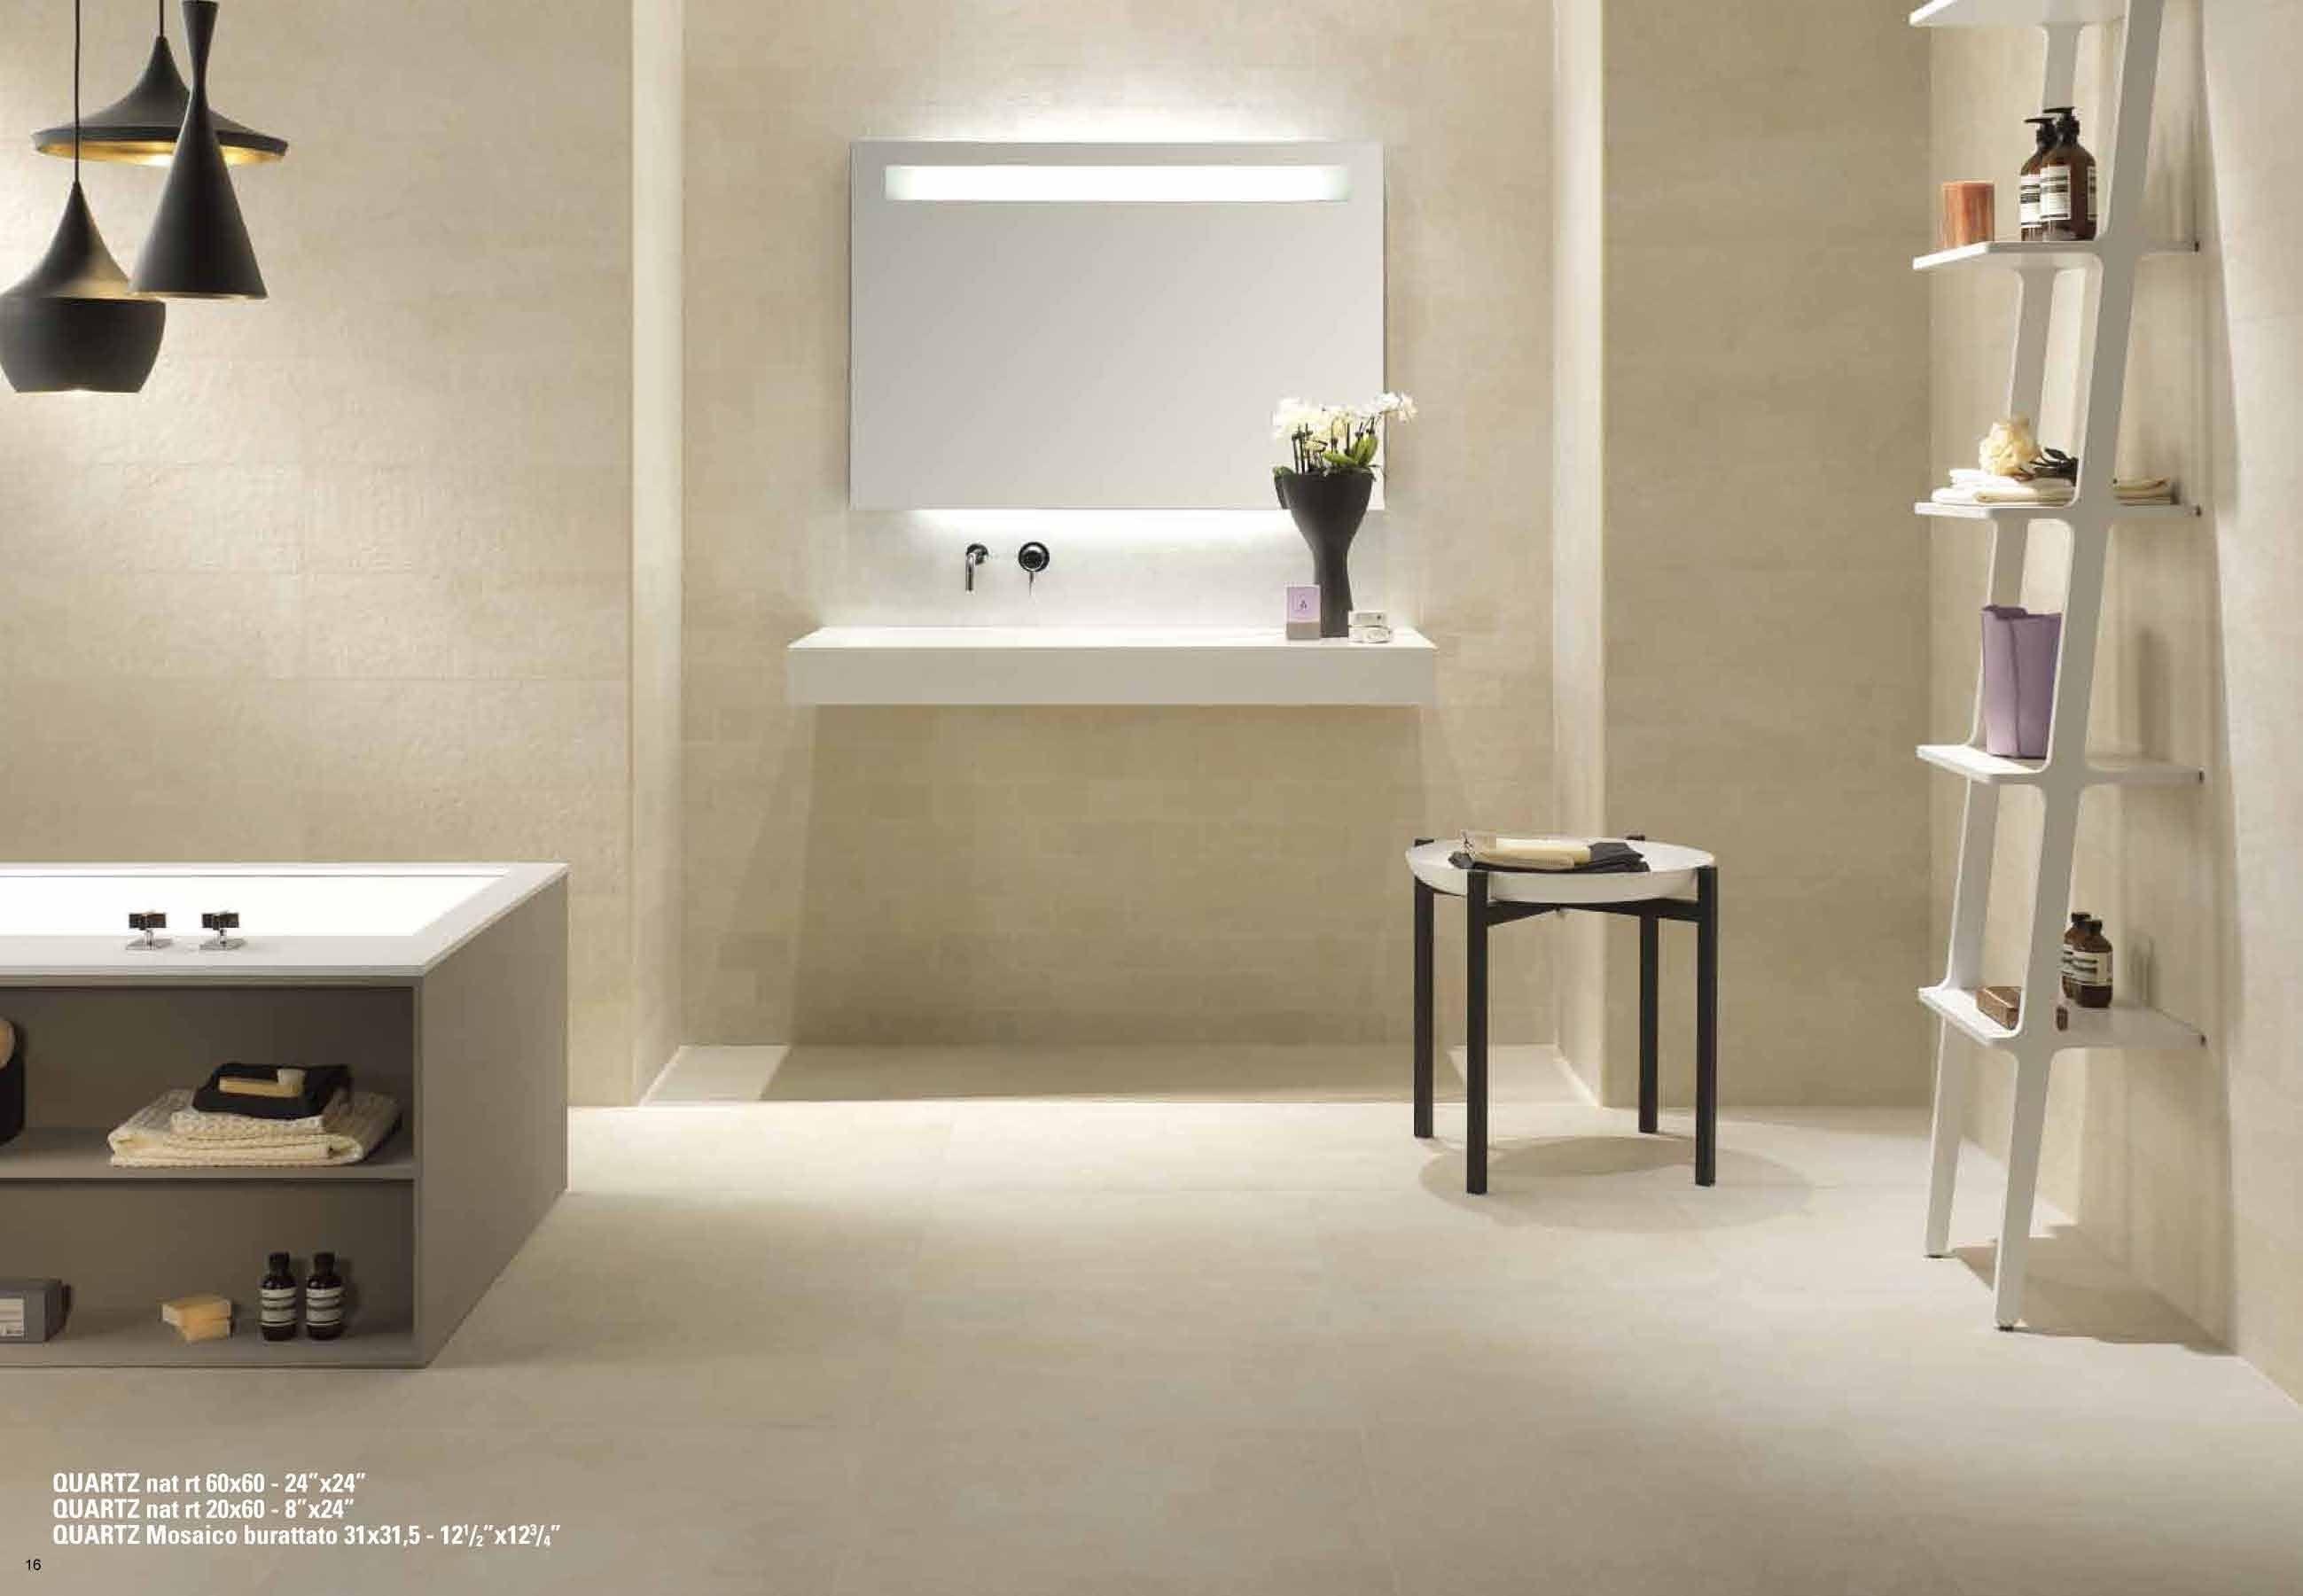 #Keope #Sunrise Quartz 60x60 Cm O161 | #Keramik #Steinoptik #60x60 |